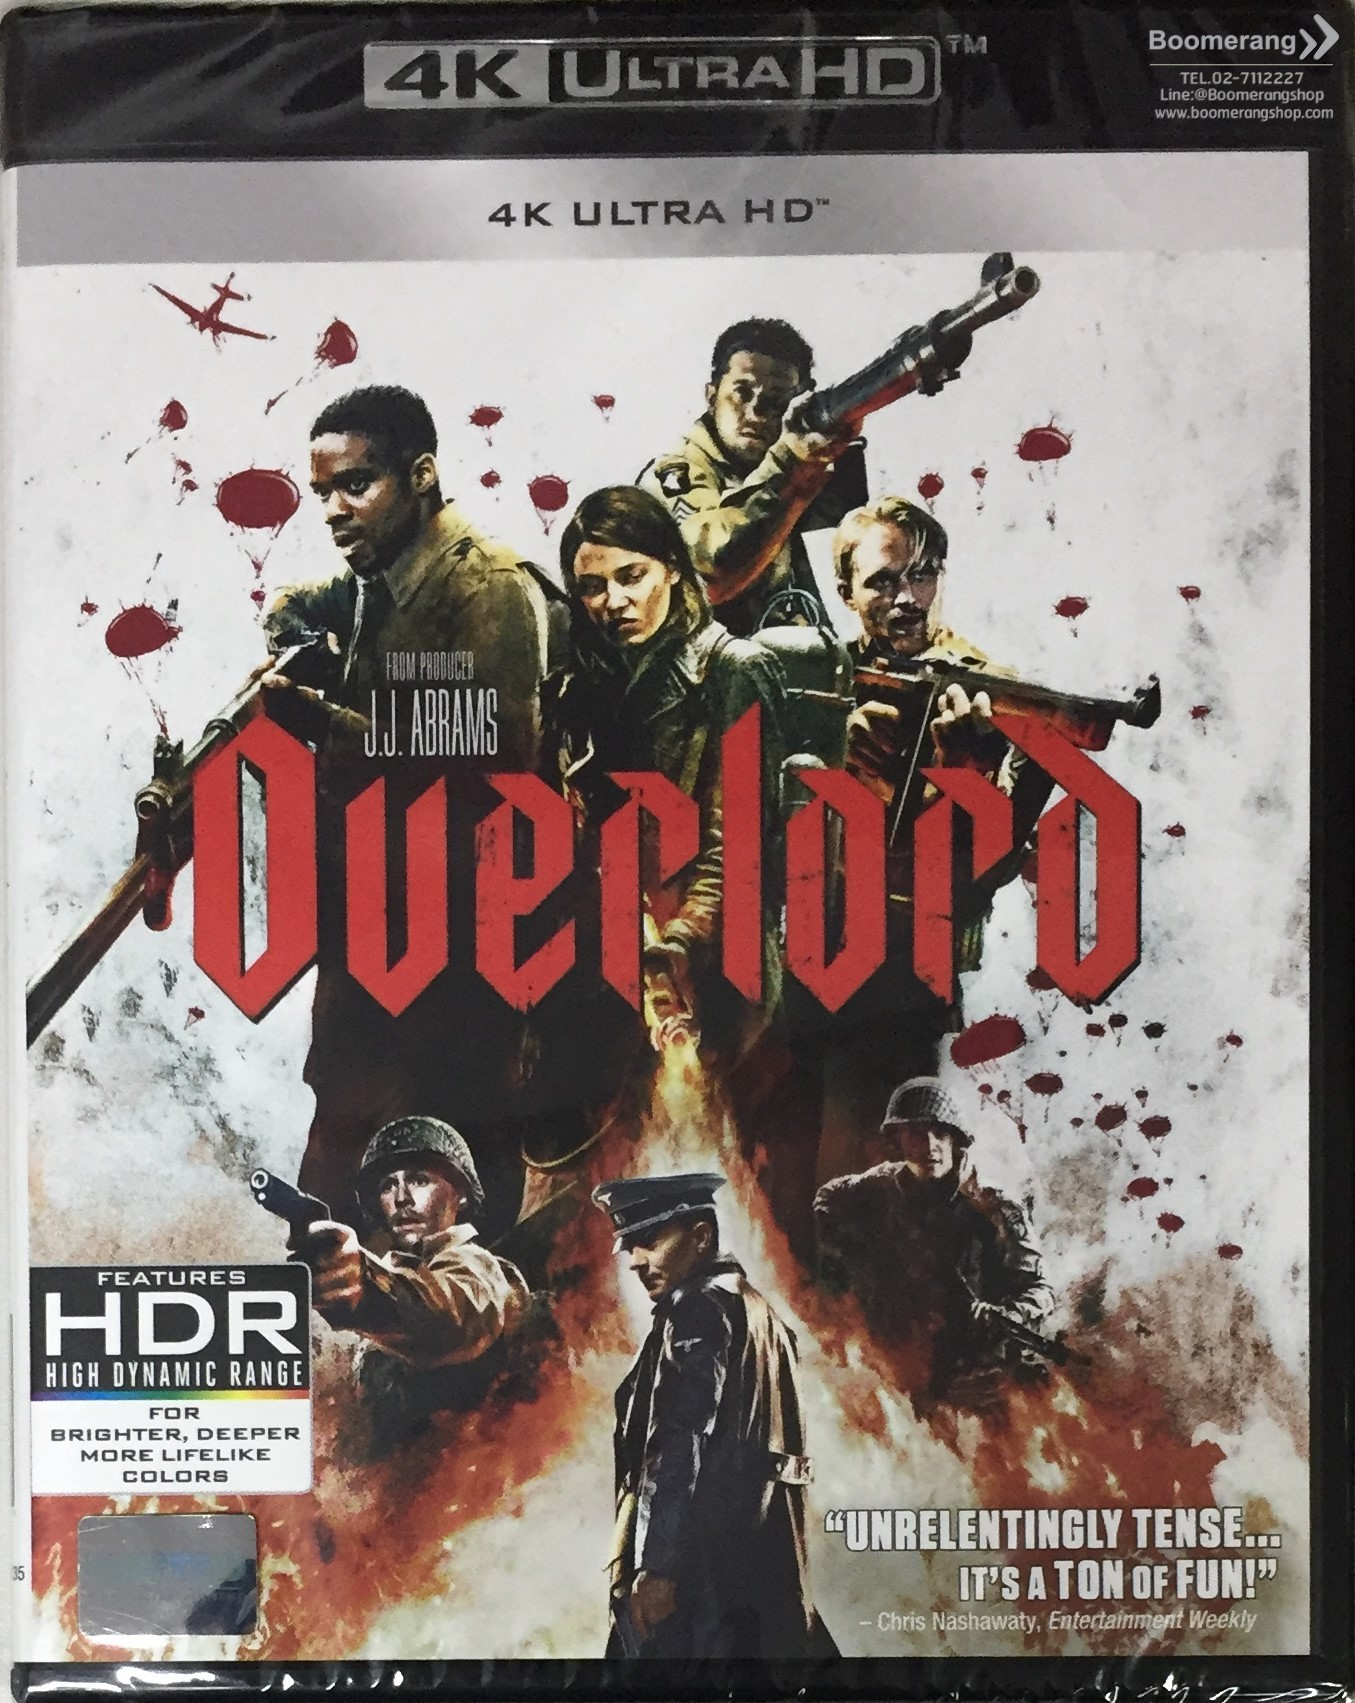 Overlord/ปฏิบัติการโอเวอร์ลอร์ด (4K Ultra HD) (4K มีซับไทย